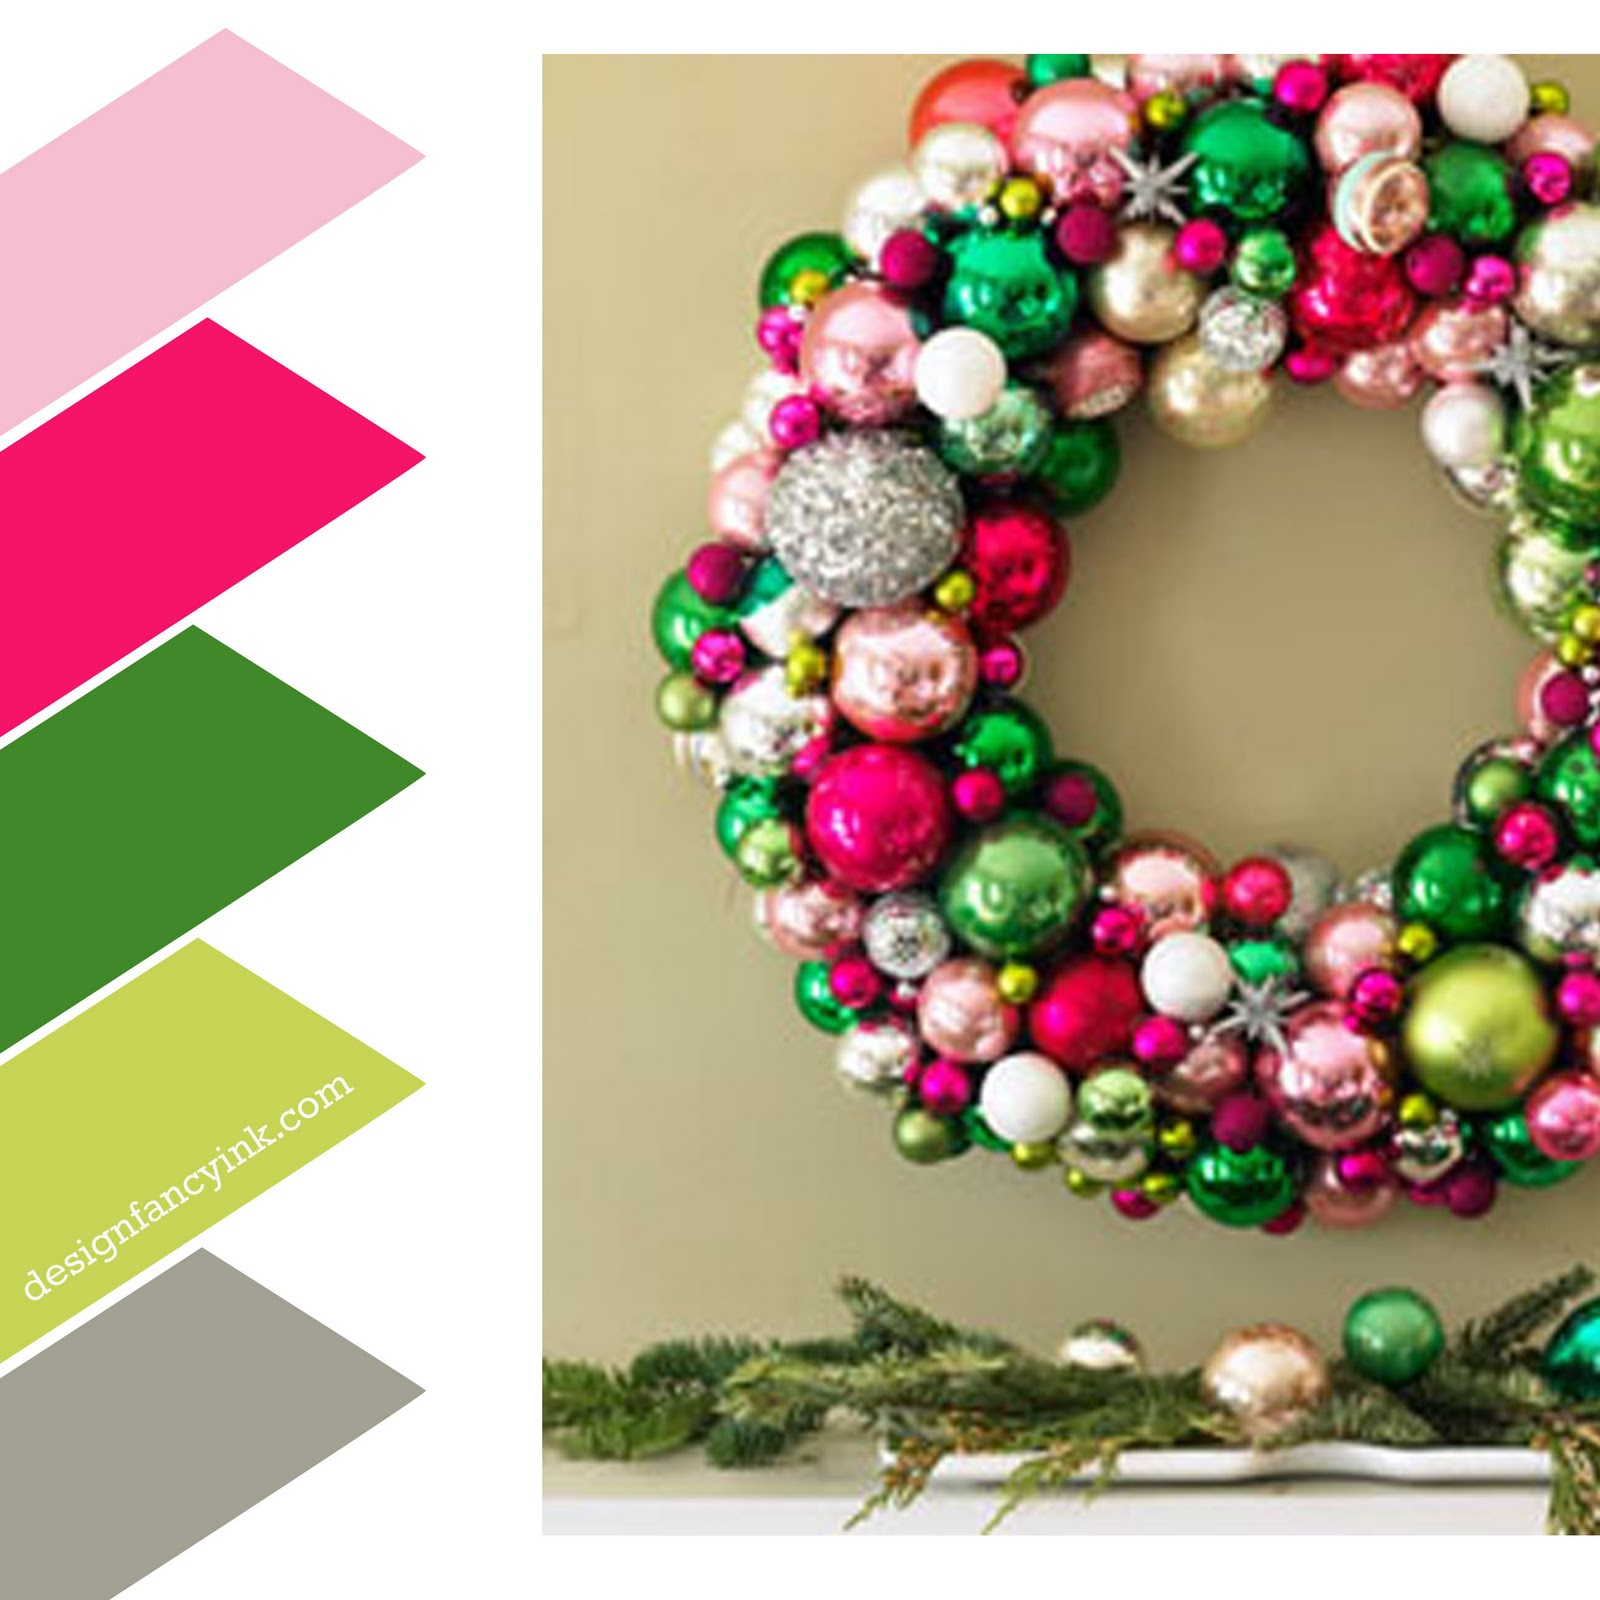 Christmas Picture Color Schemes.Emily Camp Design Design Fancy Christmas Colors